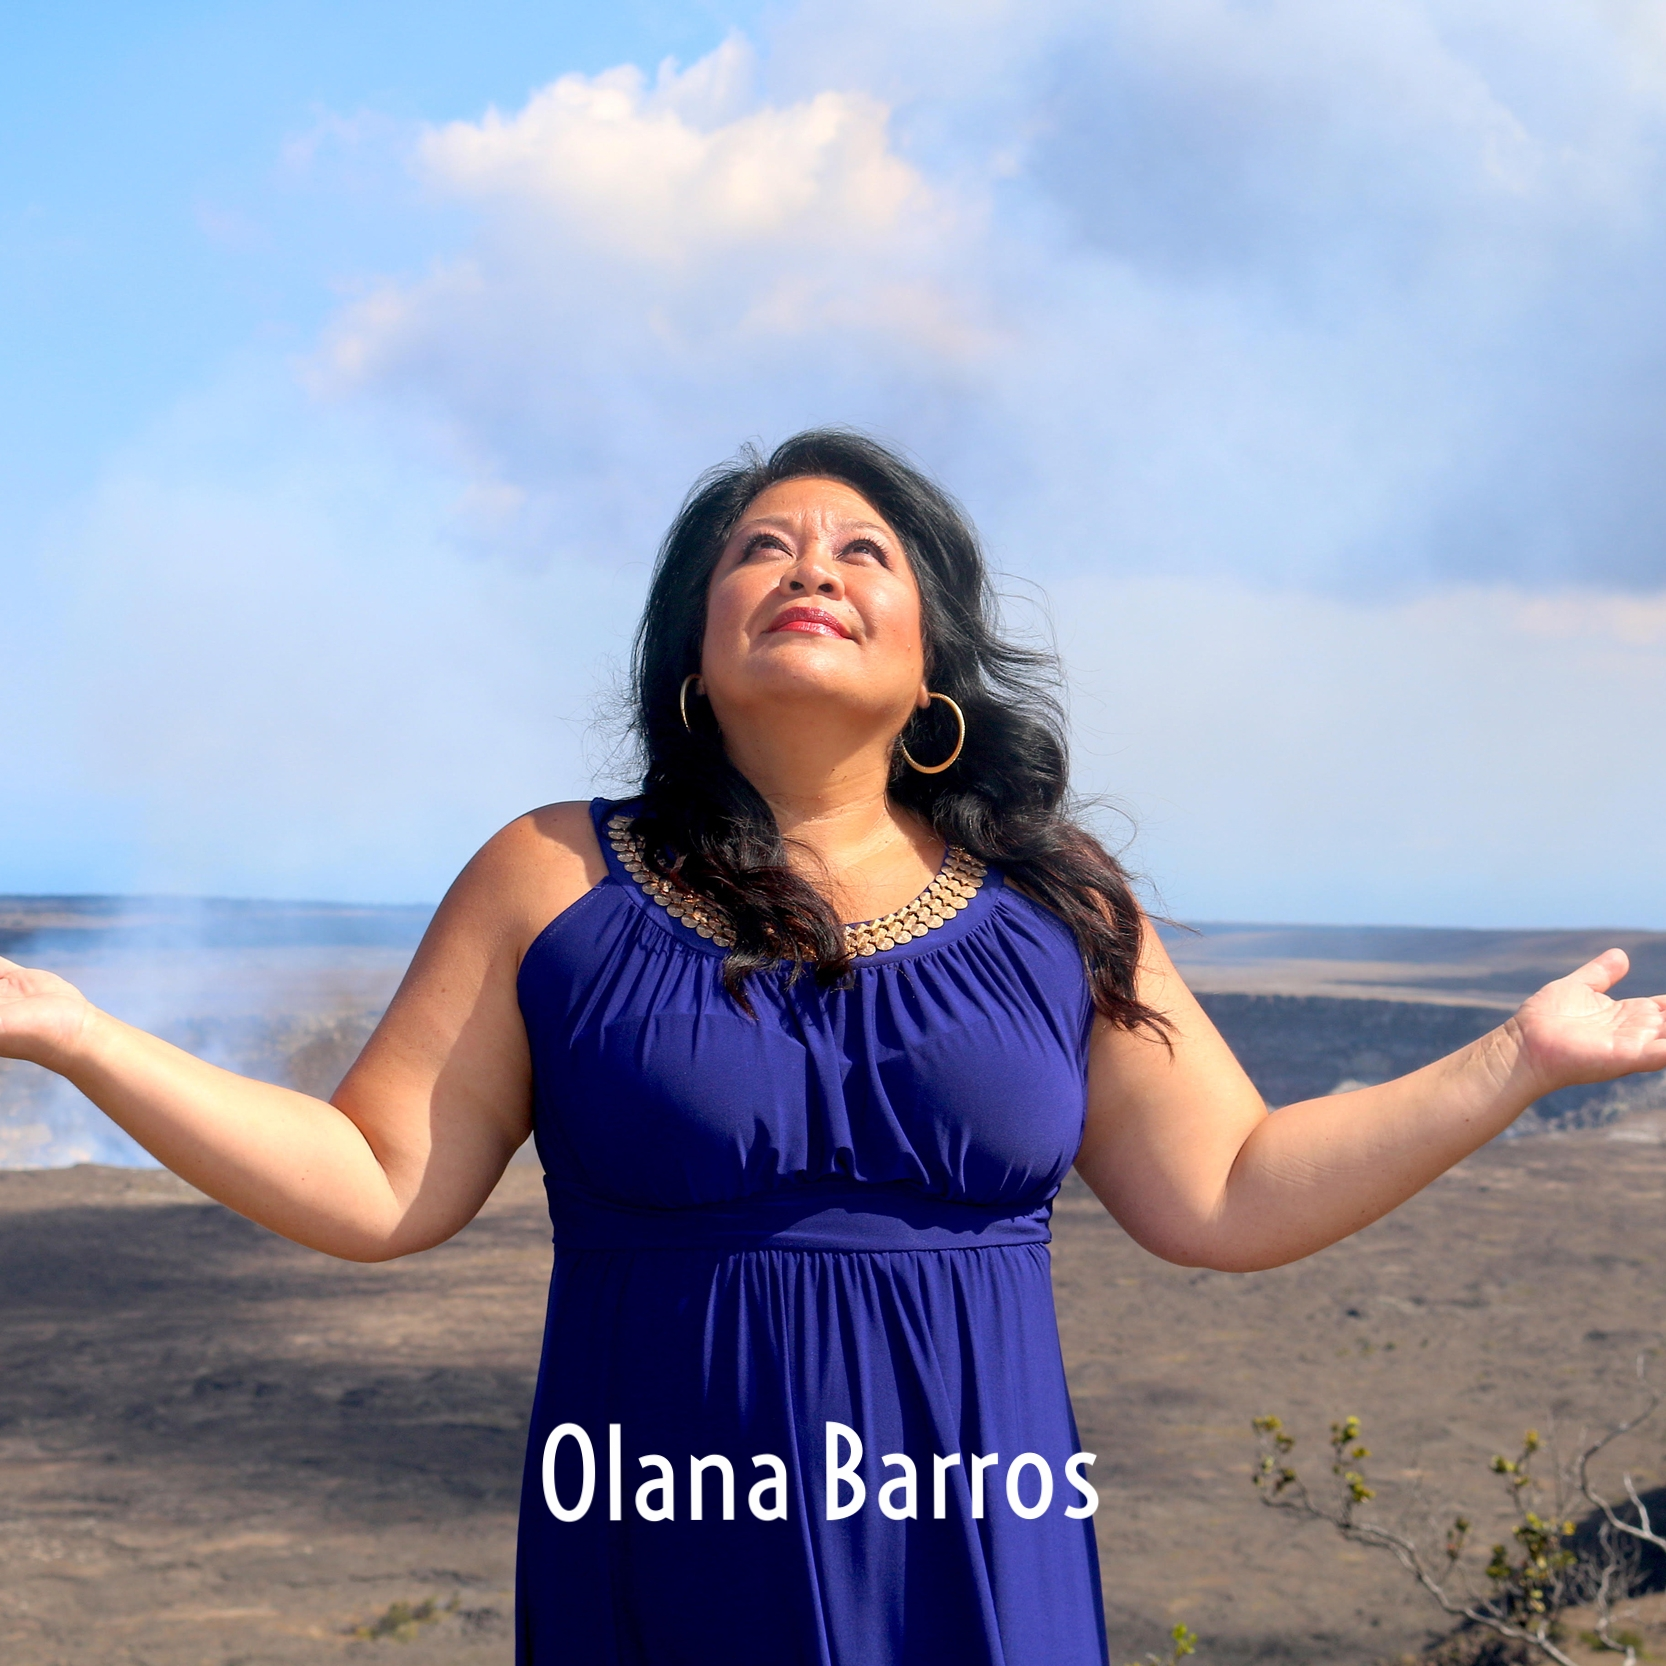 Olana Barros